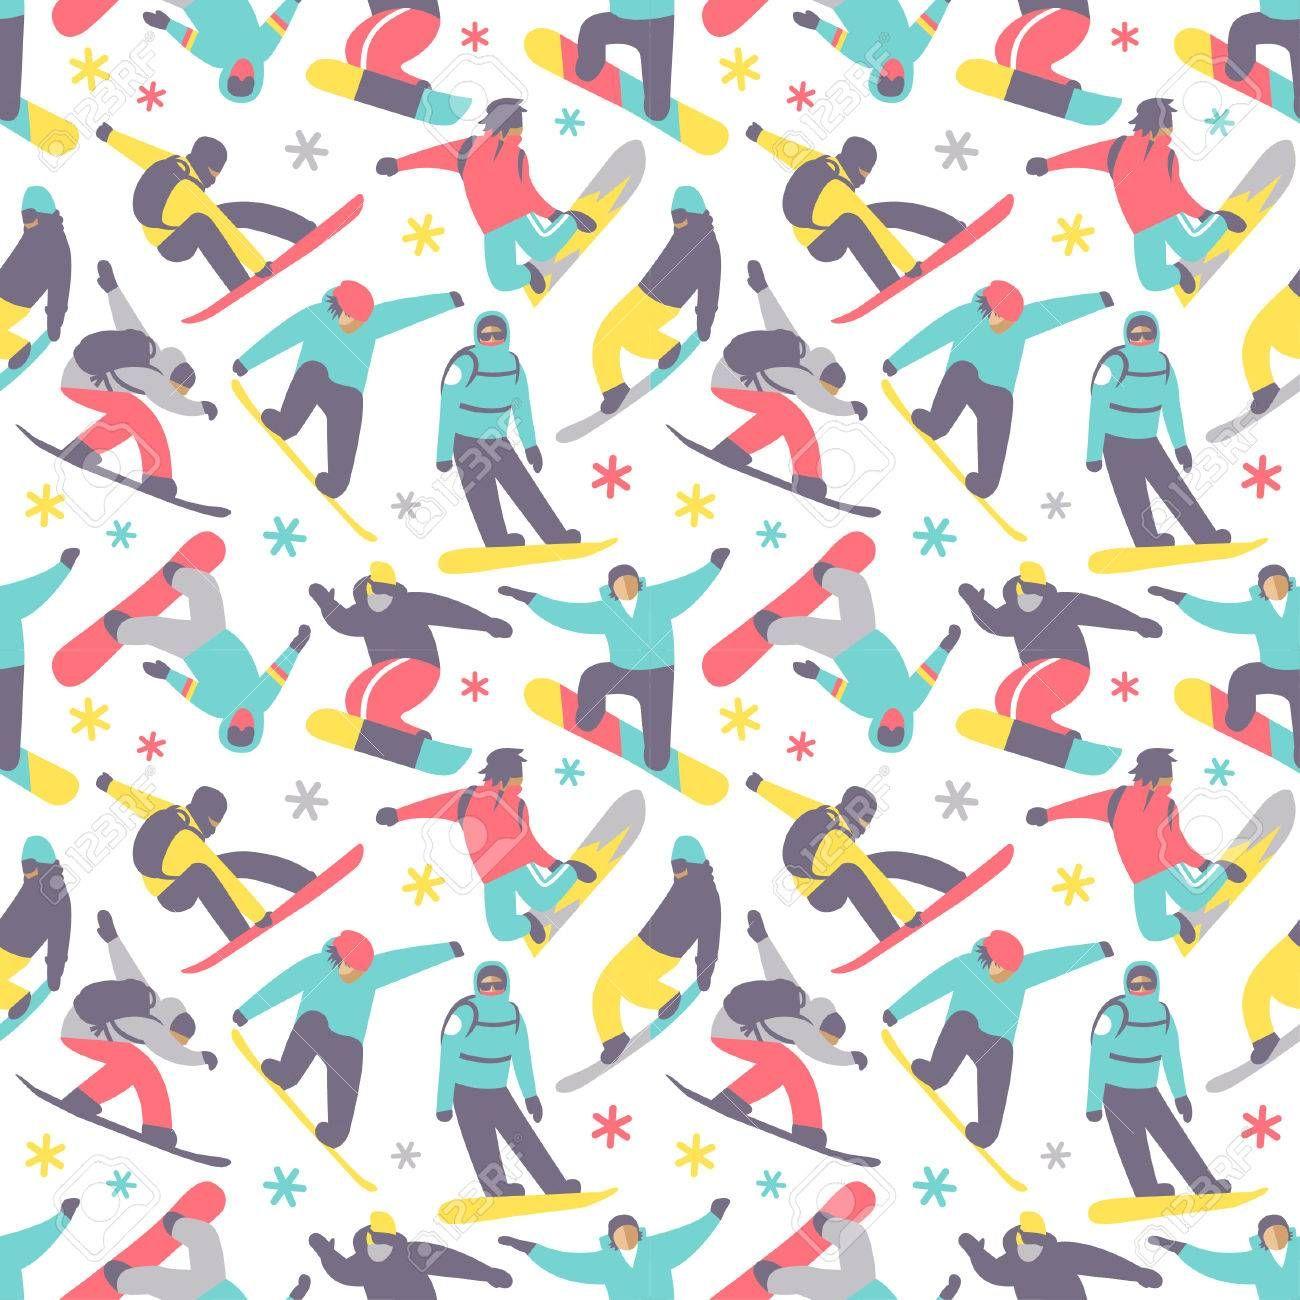 Snowboard Pattern